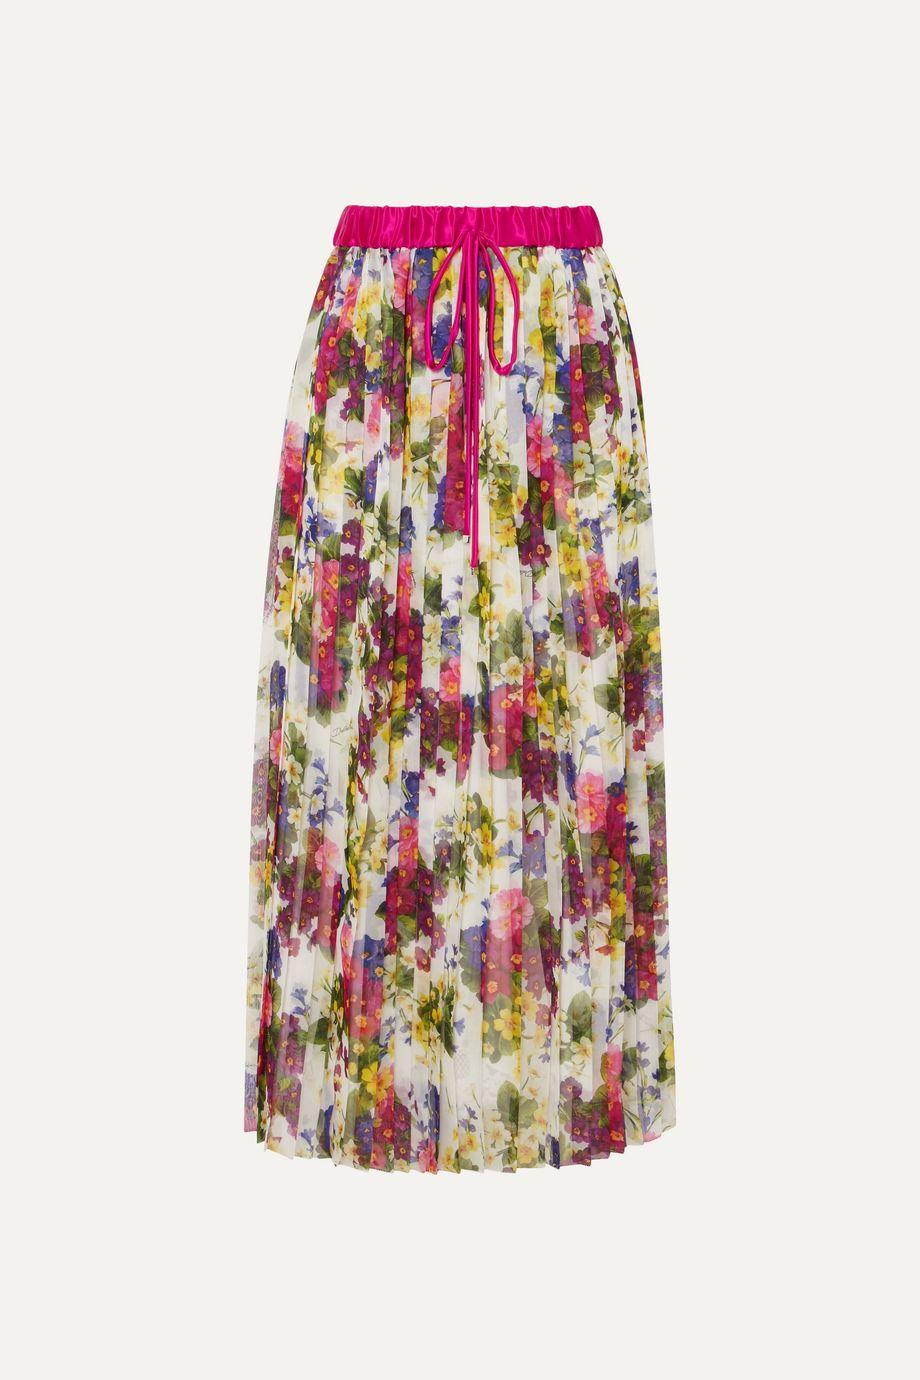 Dolce & Gabbana Pleated printed chiffon midi skirt